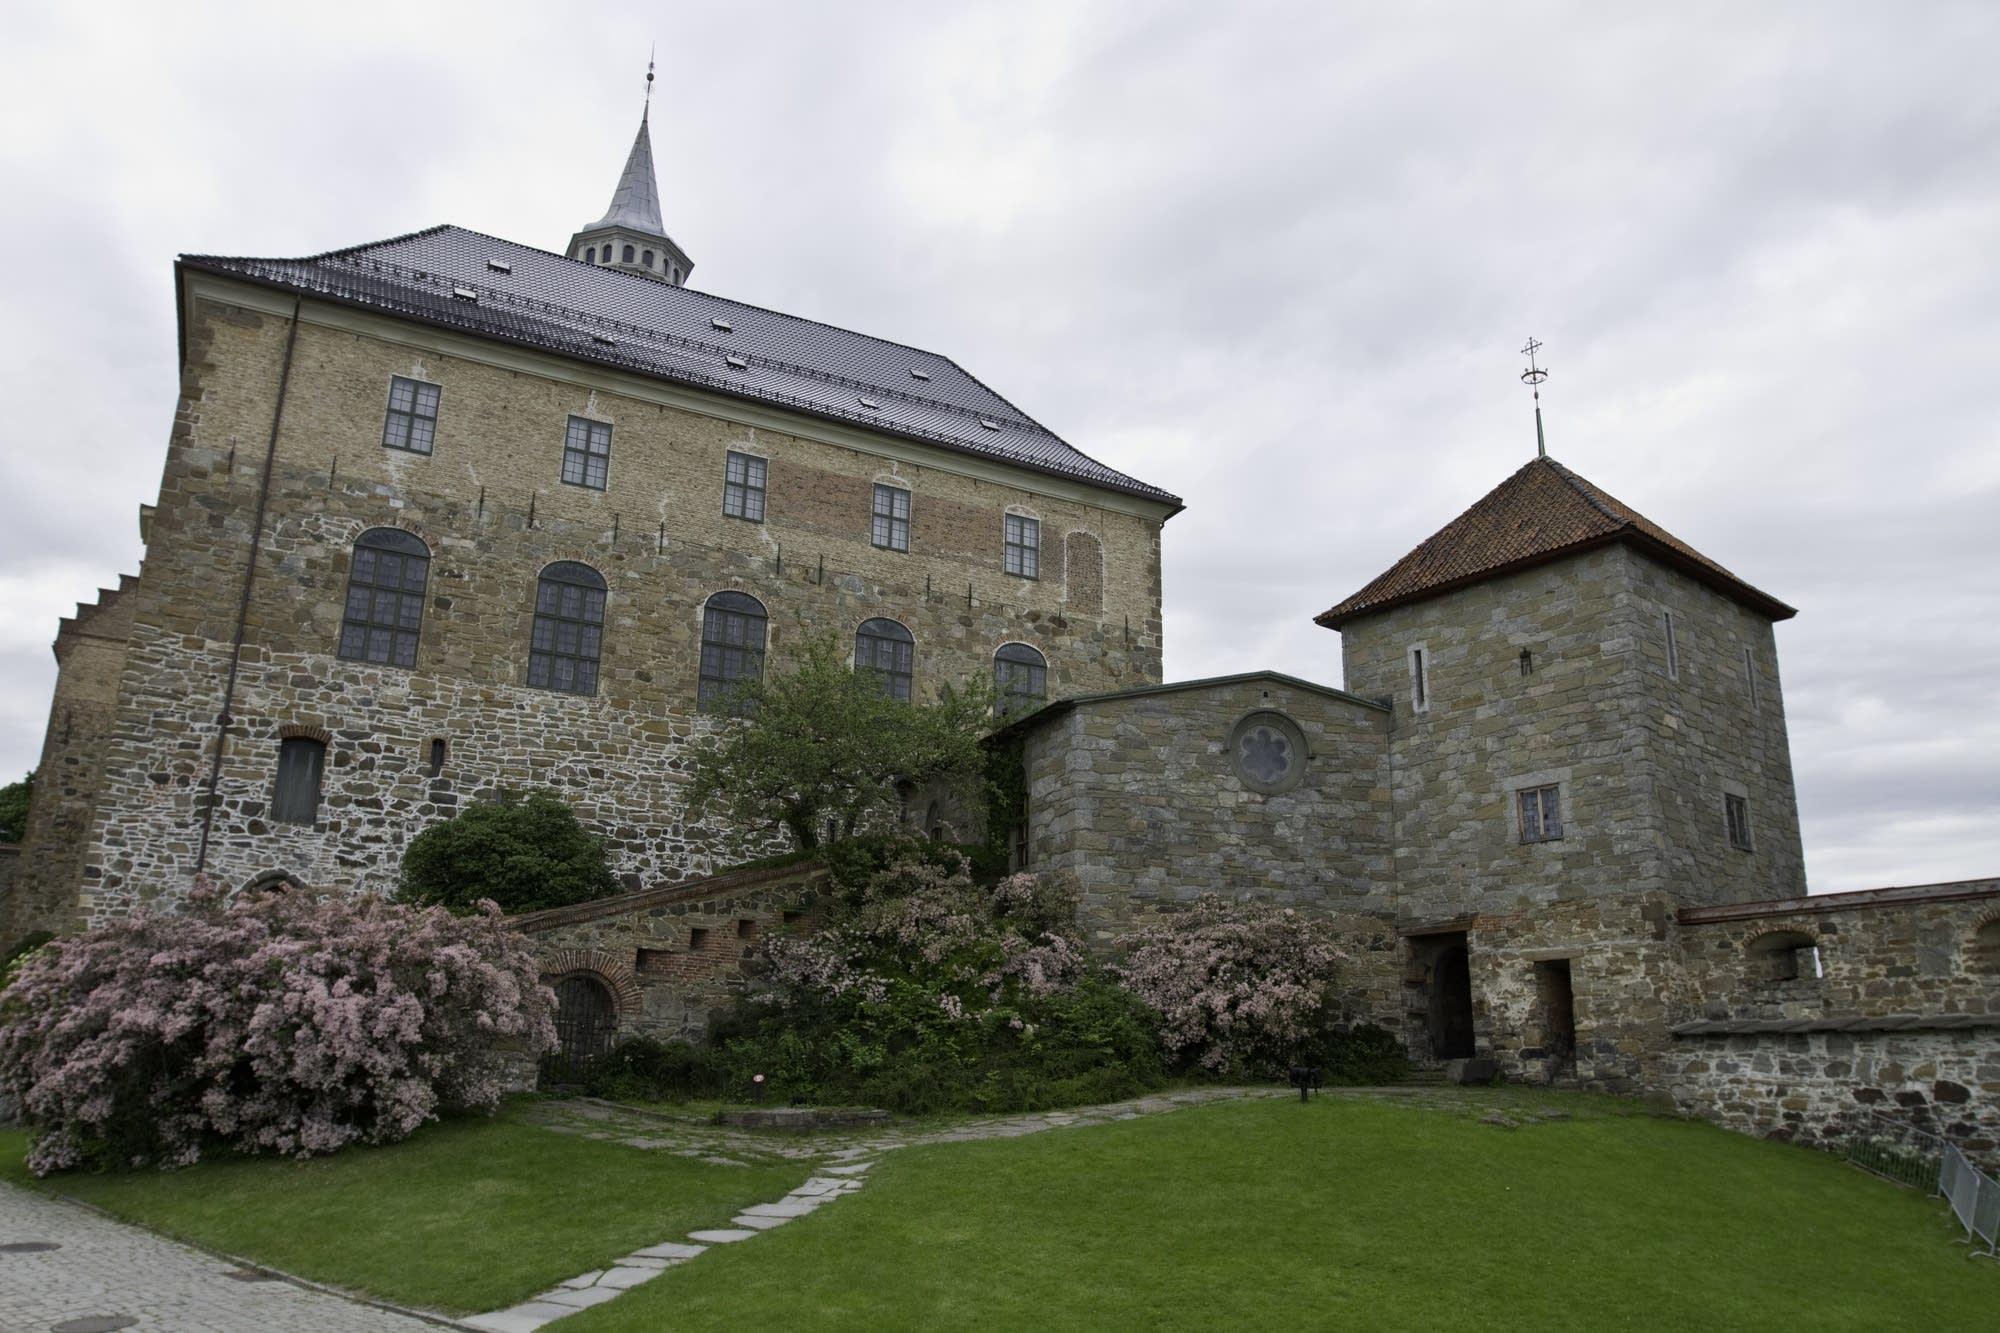 Oslo - 32 - castle buildings exterior